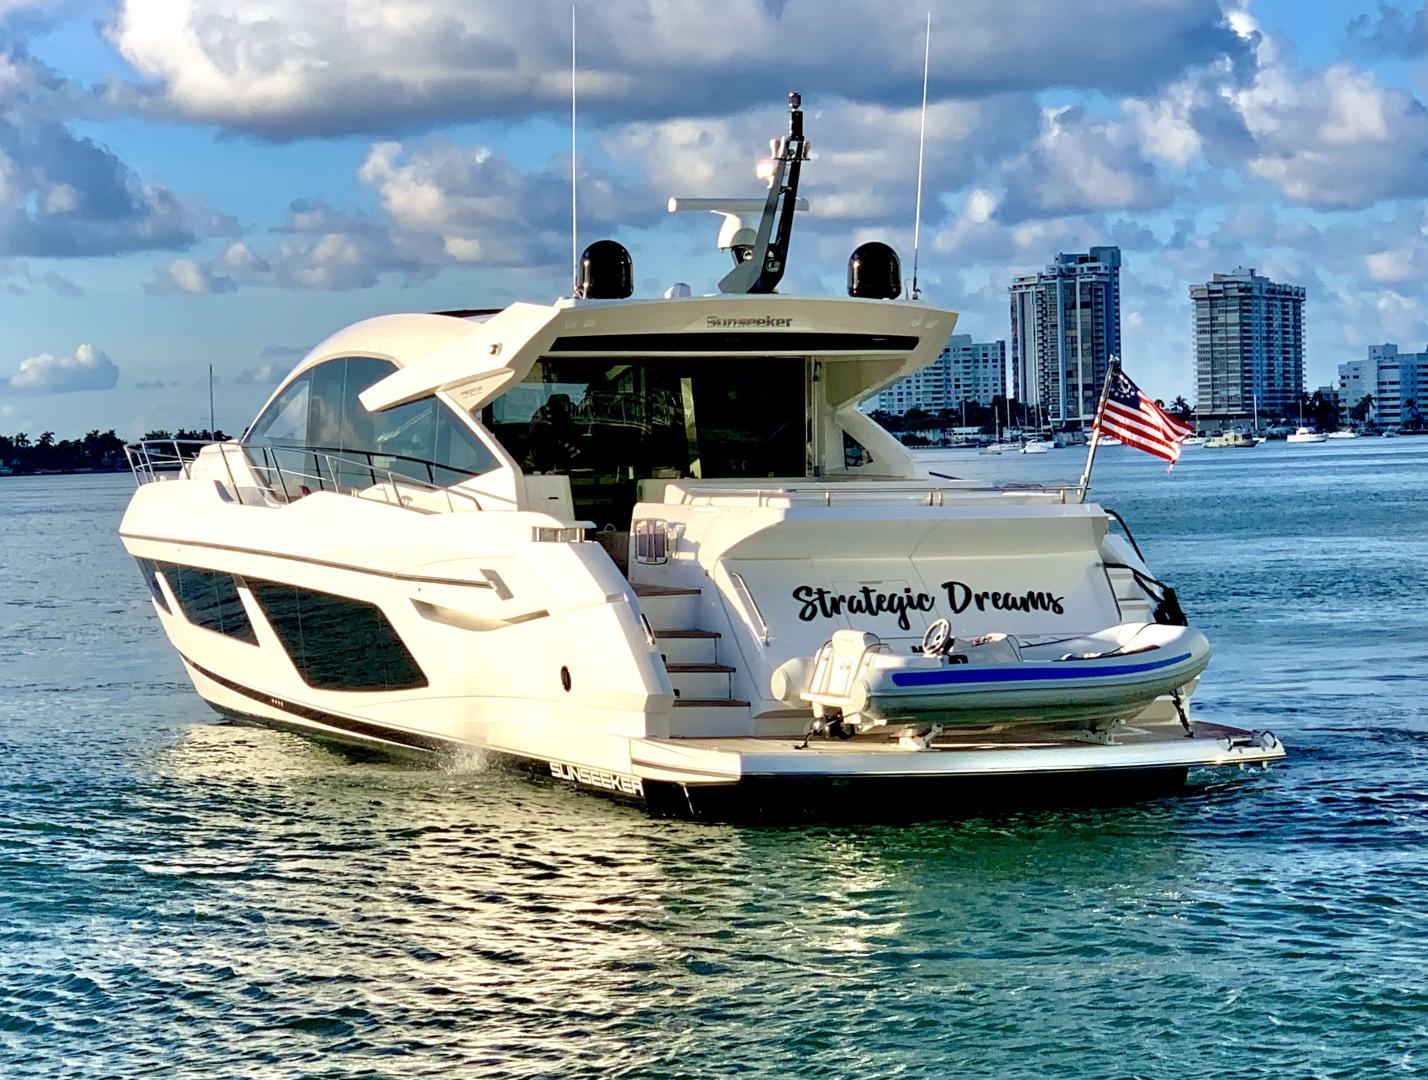 Sunseeker-74 Predator 2019-Strategic Dreams Fort Lauderdale-Florida-United States-1255906 | Thumbnail